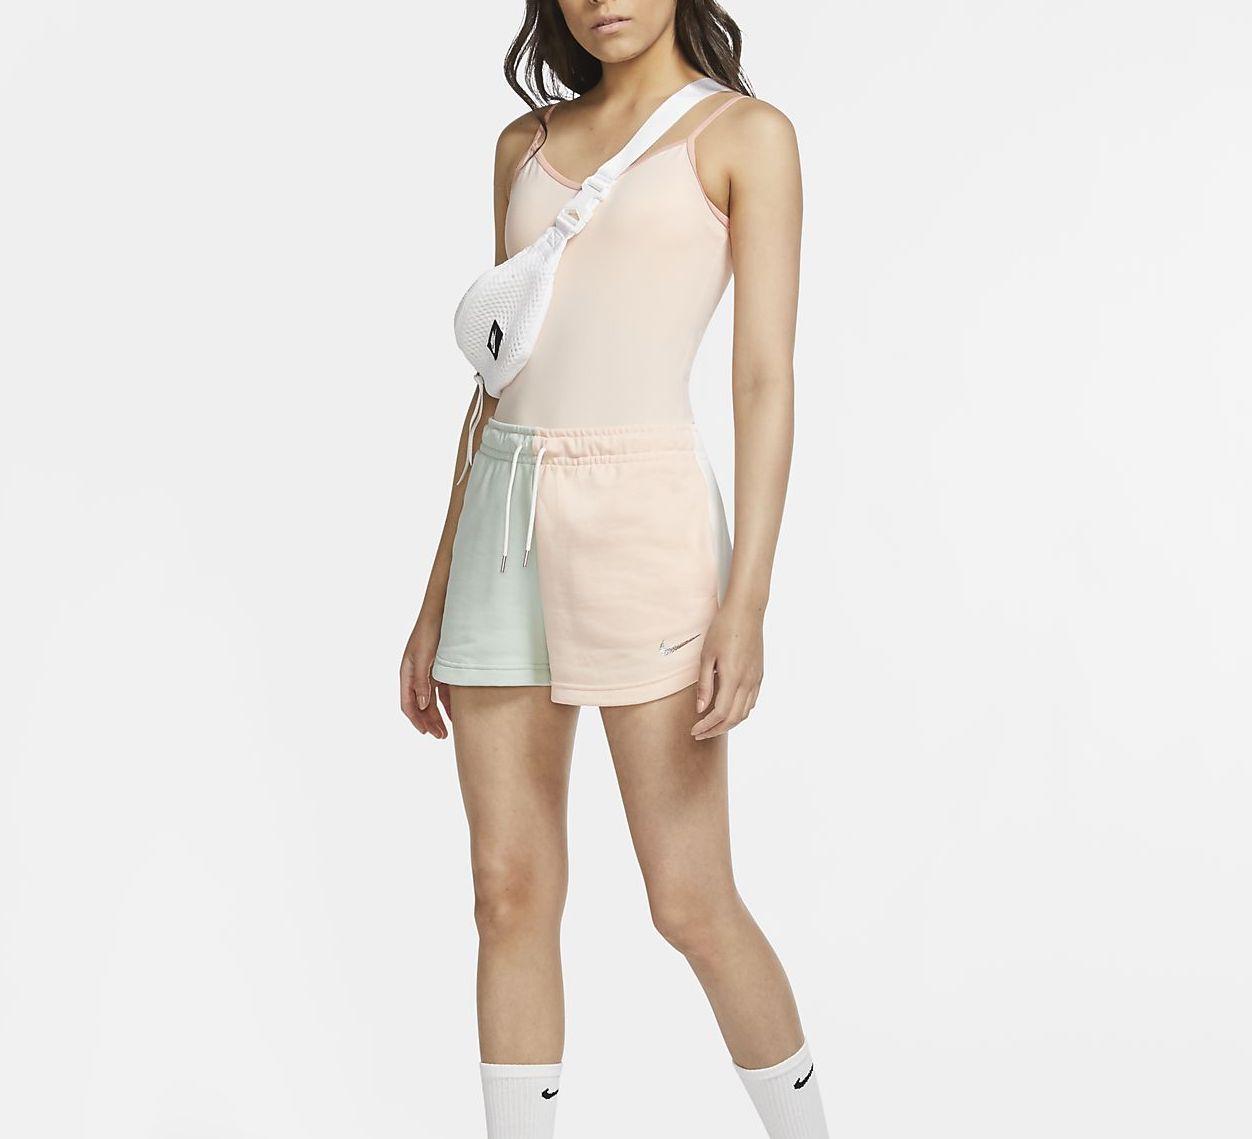 Nike Bodysuit Pink Quartz